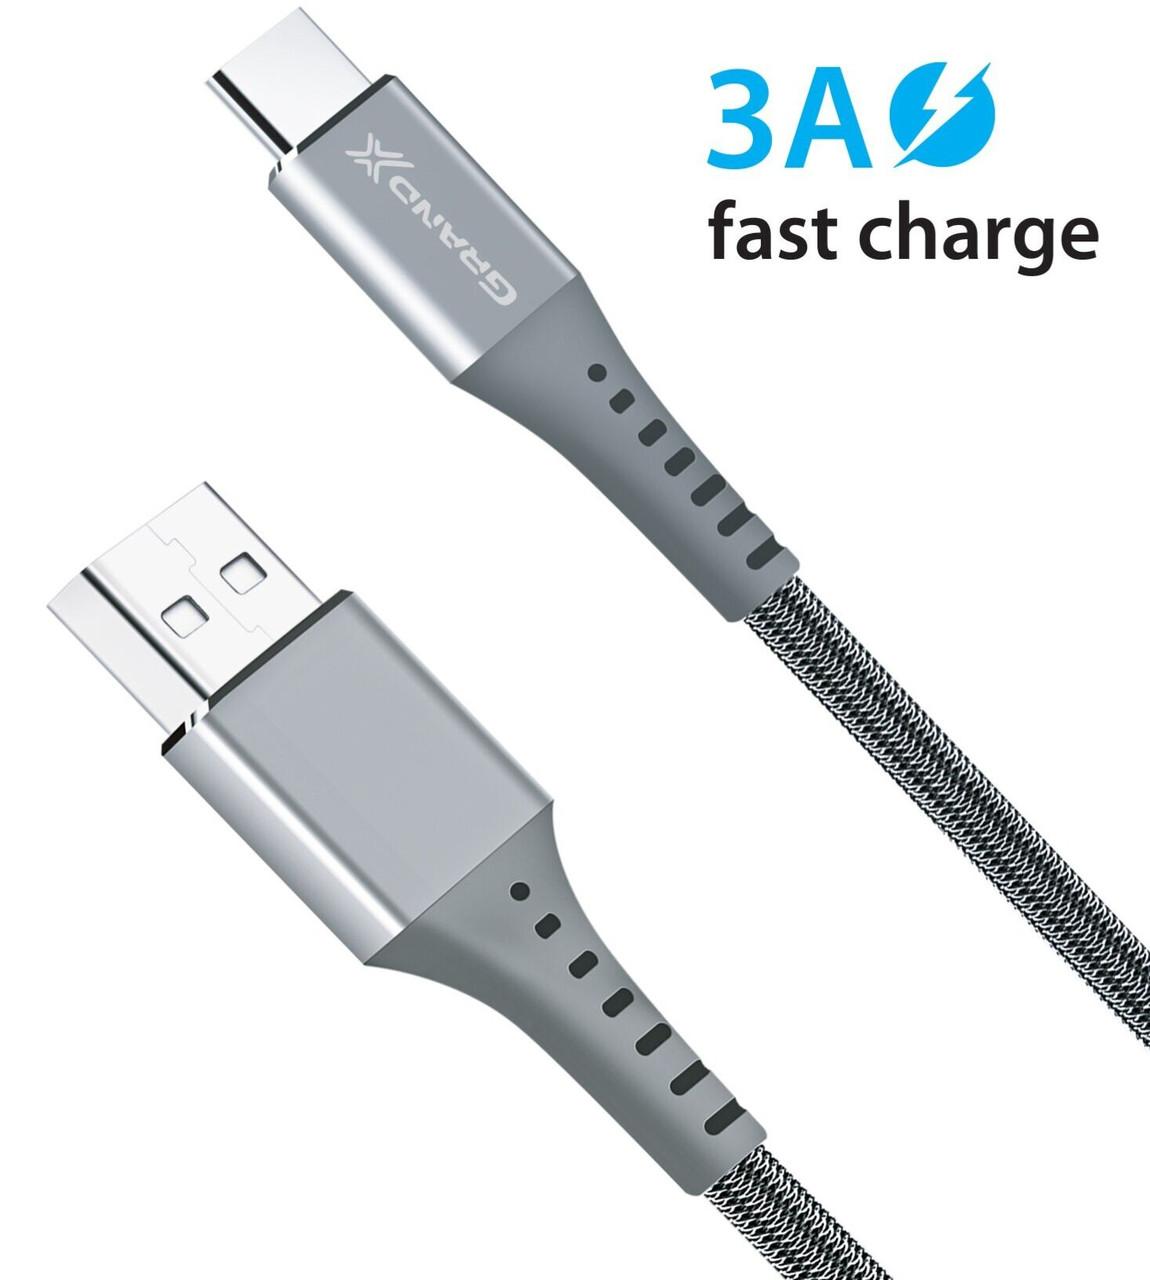 Кабель Grand-X USB-USB Type-C, 3A, 1.2м, Fast Сharge, Grey (FC-12G)